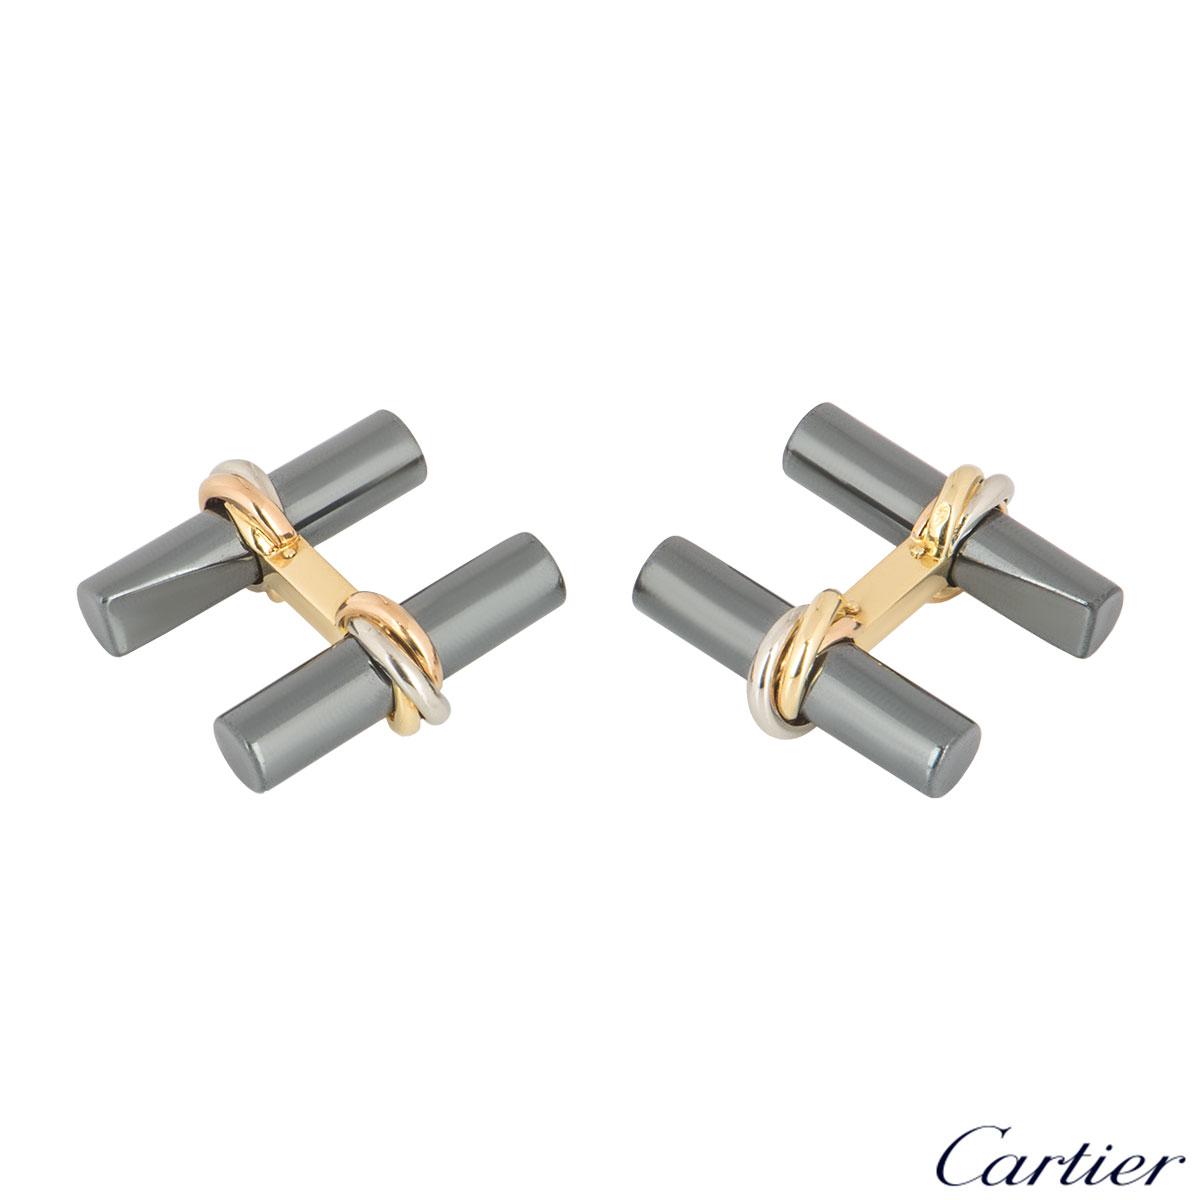 Cartier Tri-Colour Interchangeable Trinity Cufflinks